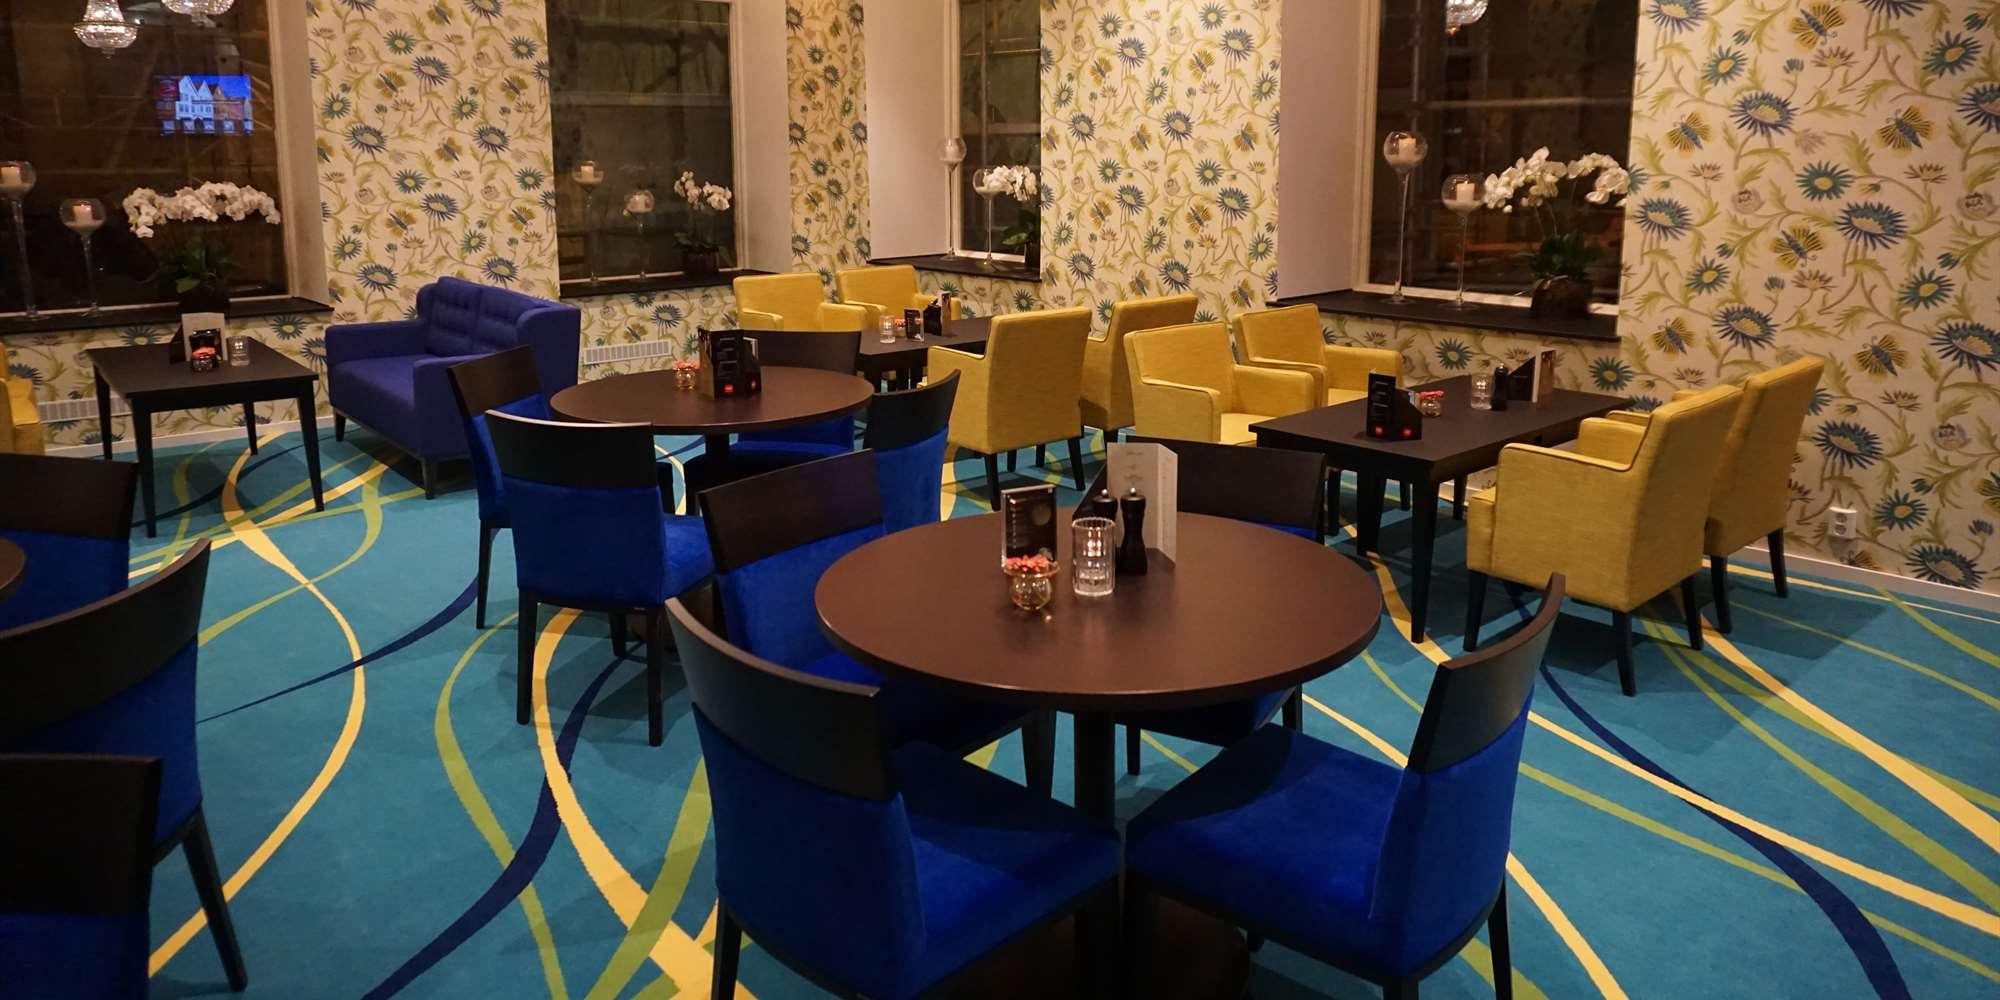 Thon Hotel Rosenkrantz - Accommodation in Bergen